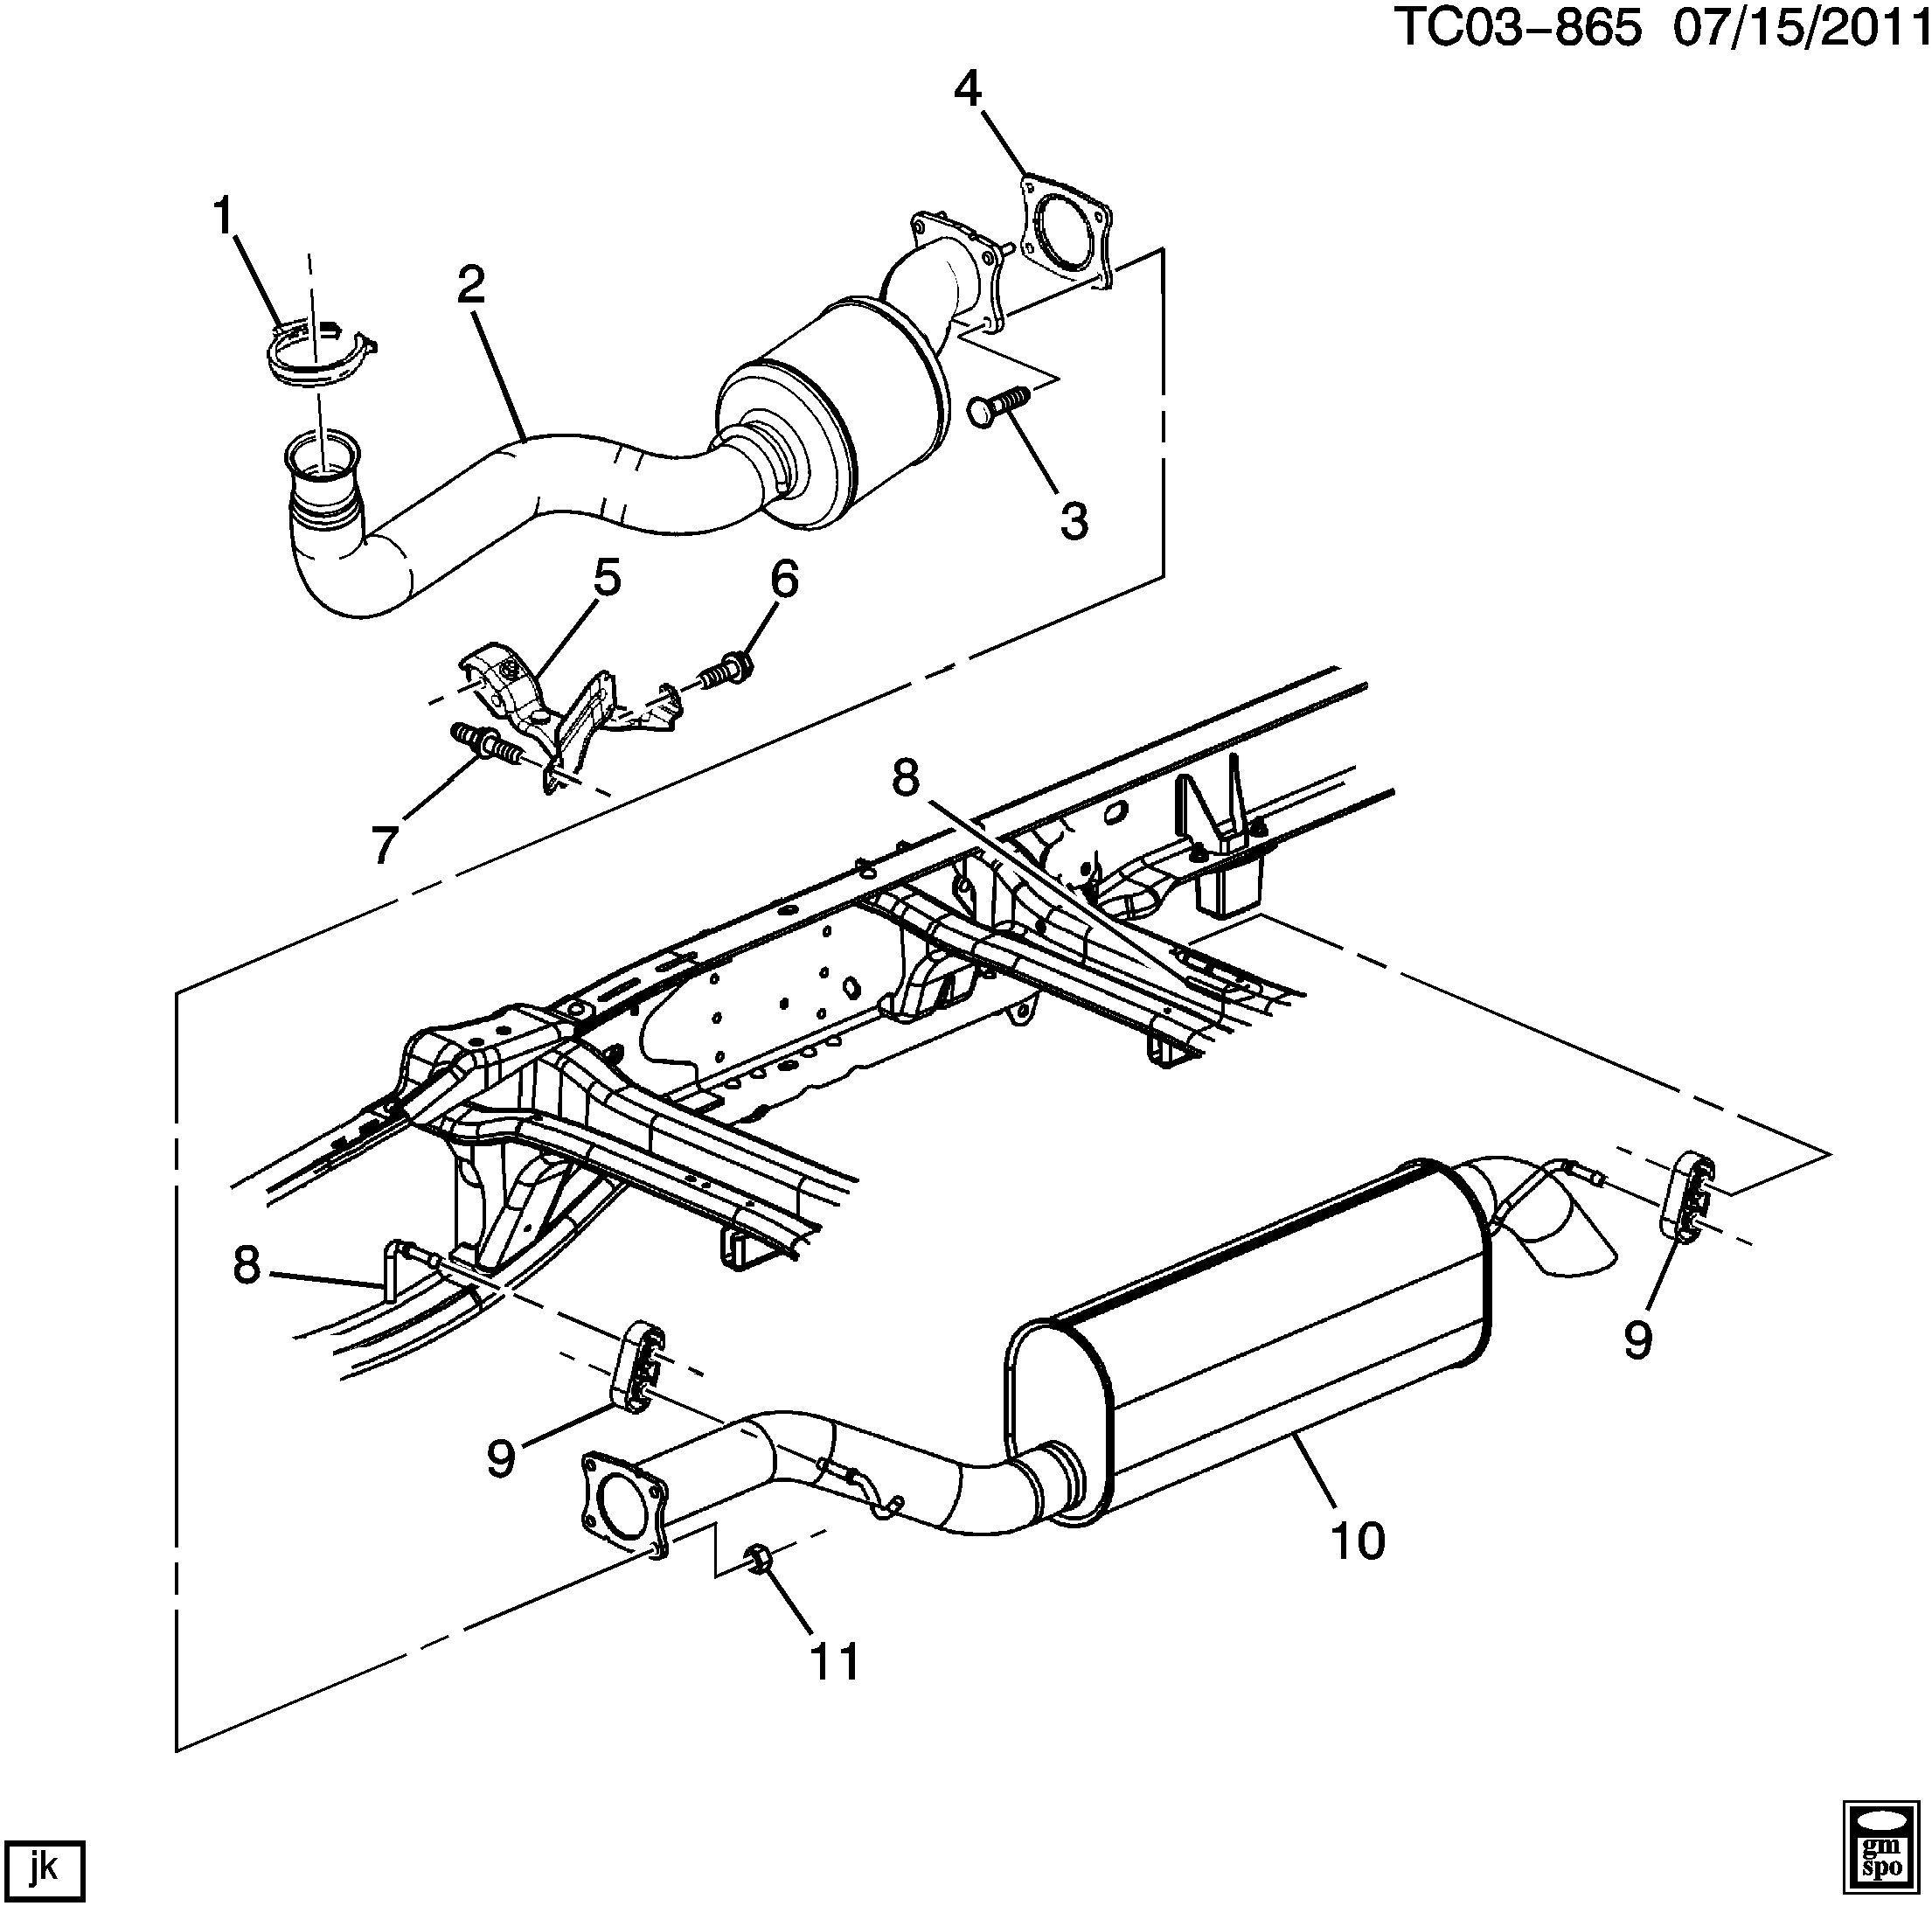 Chevrolet Silverado Converter Catalytic Converter